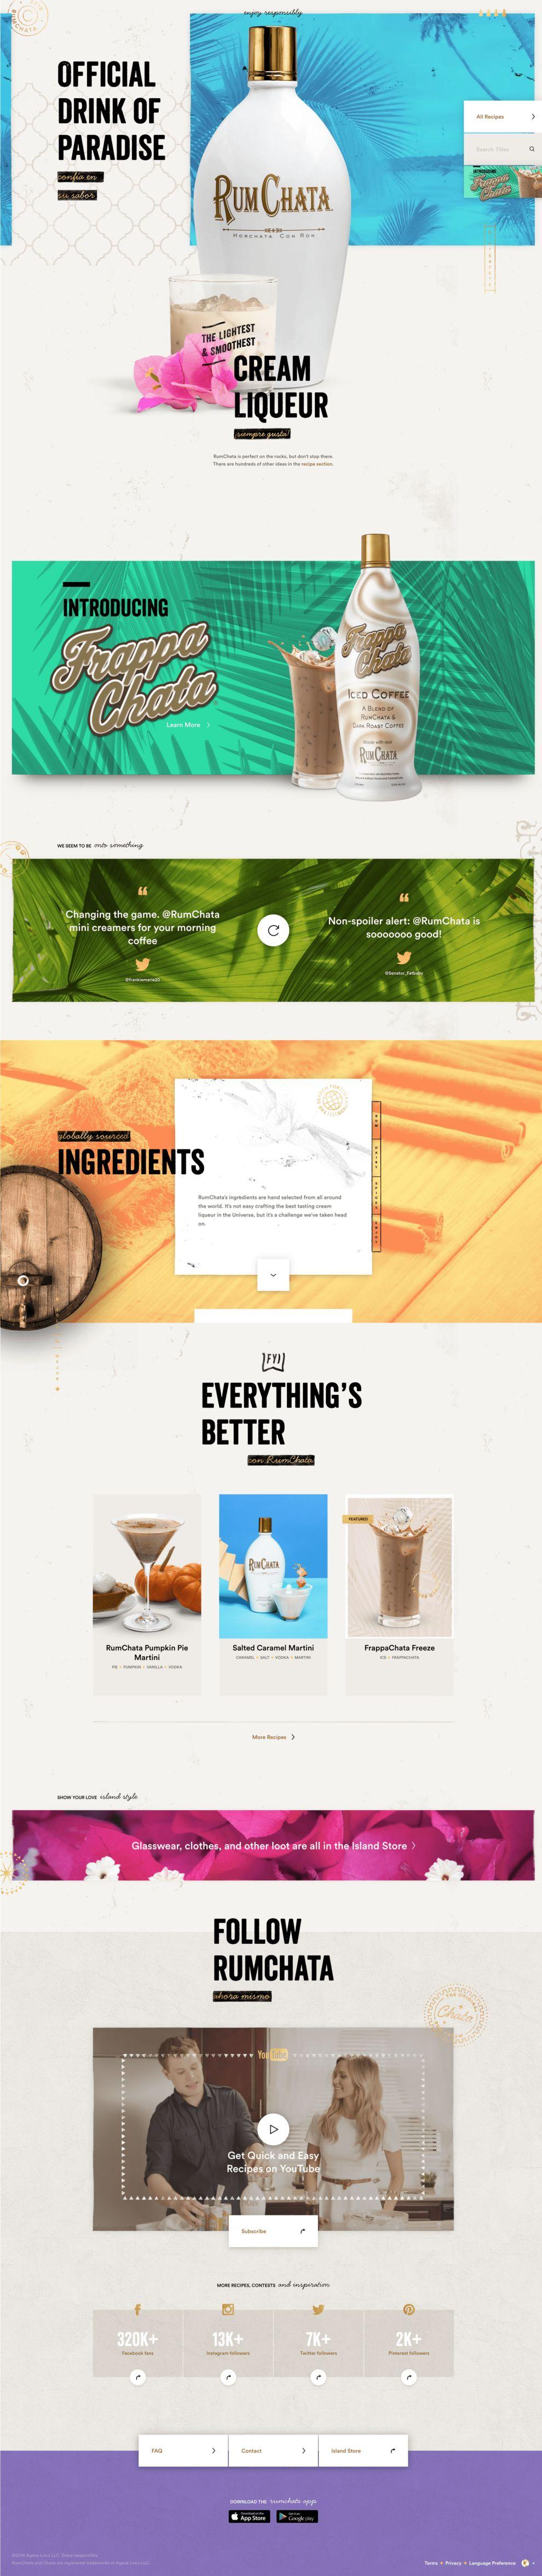 Rum Chata Beautiful Homepage